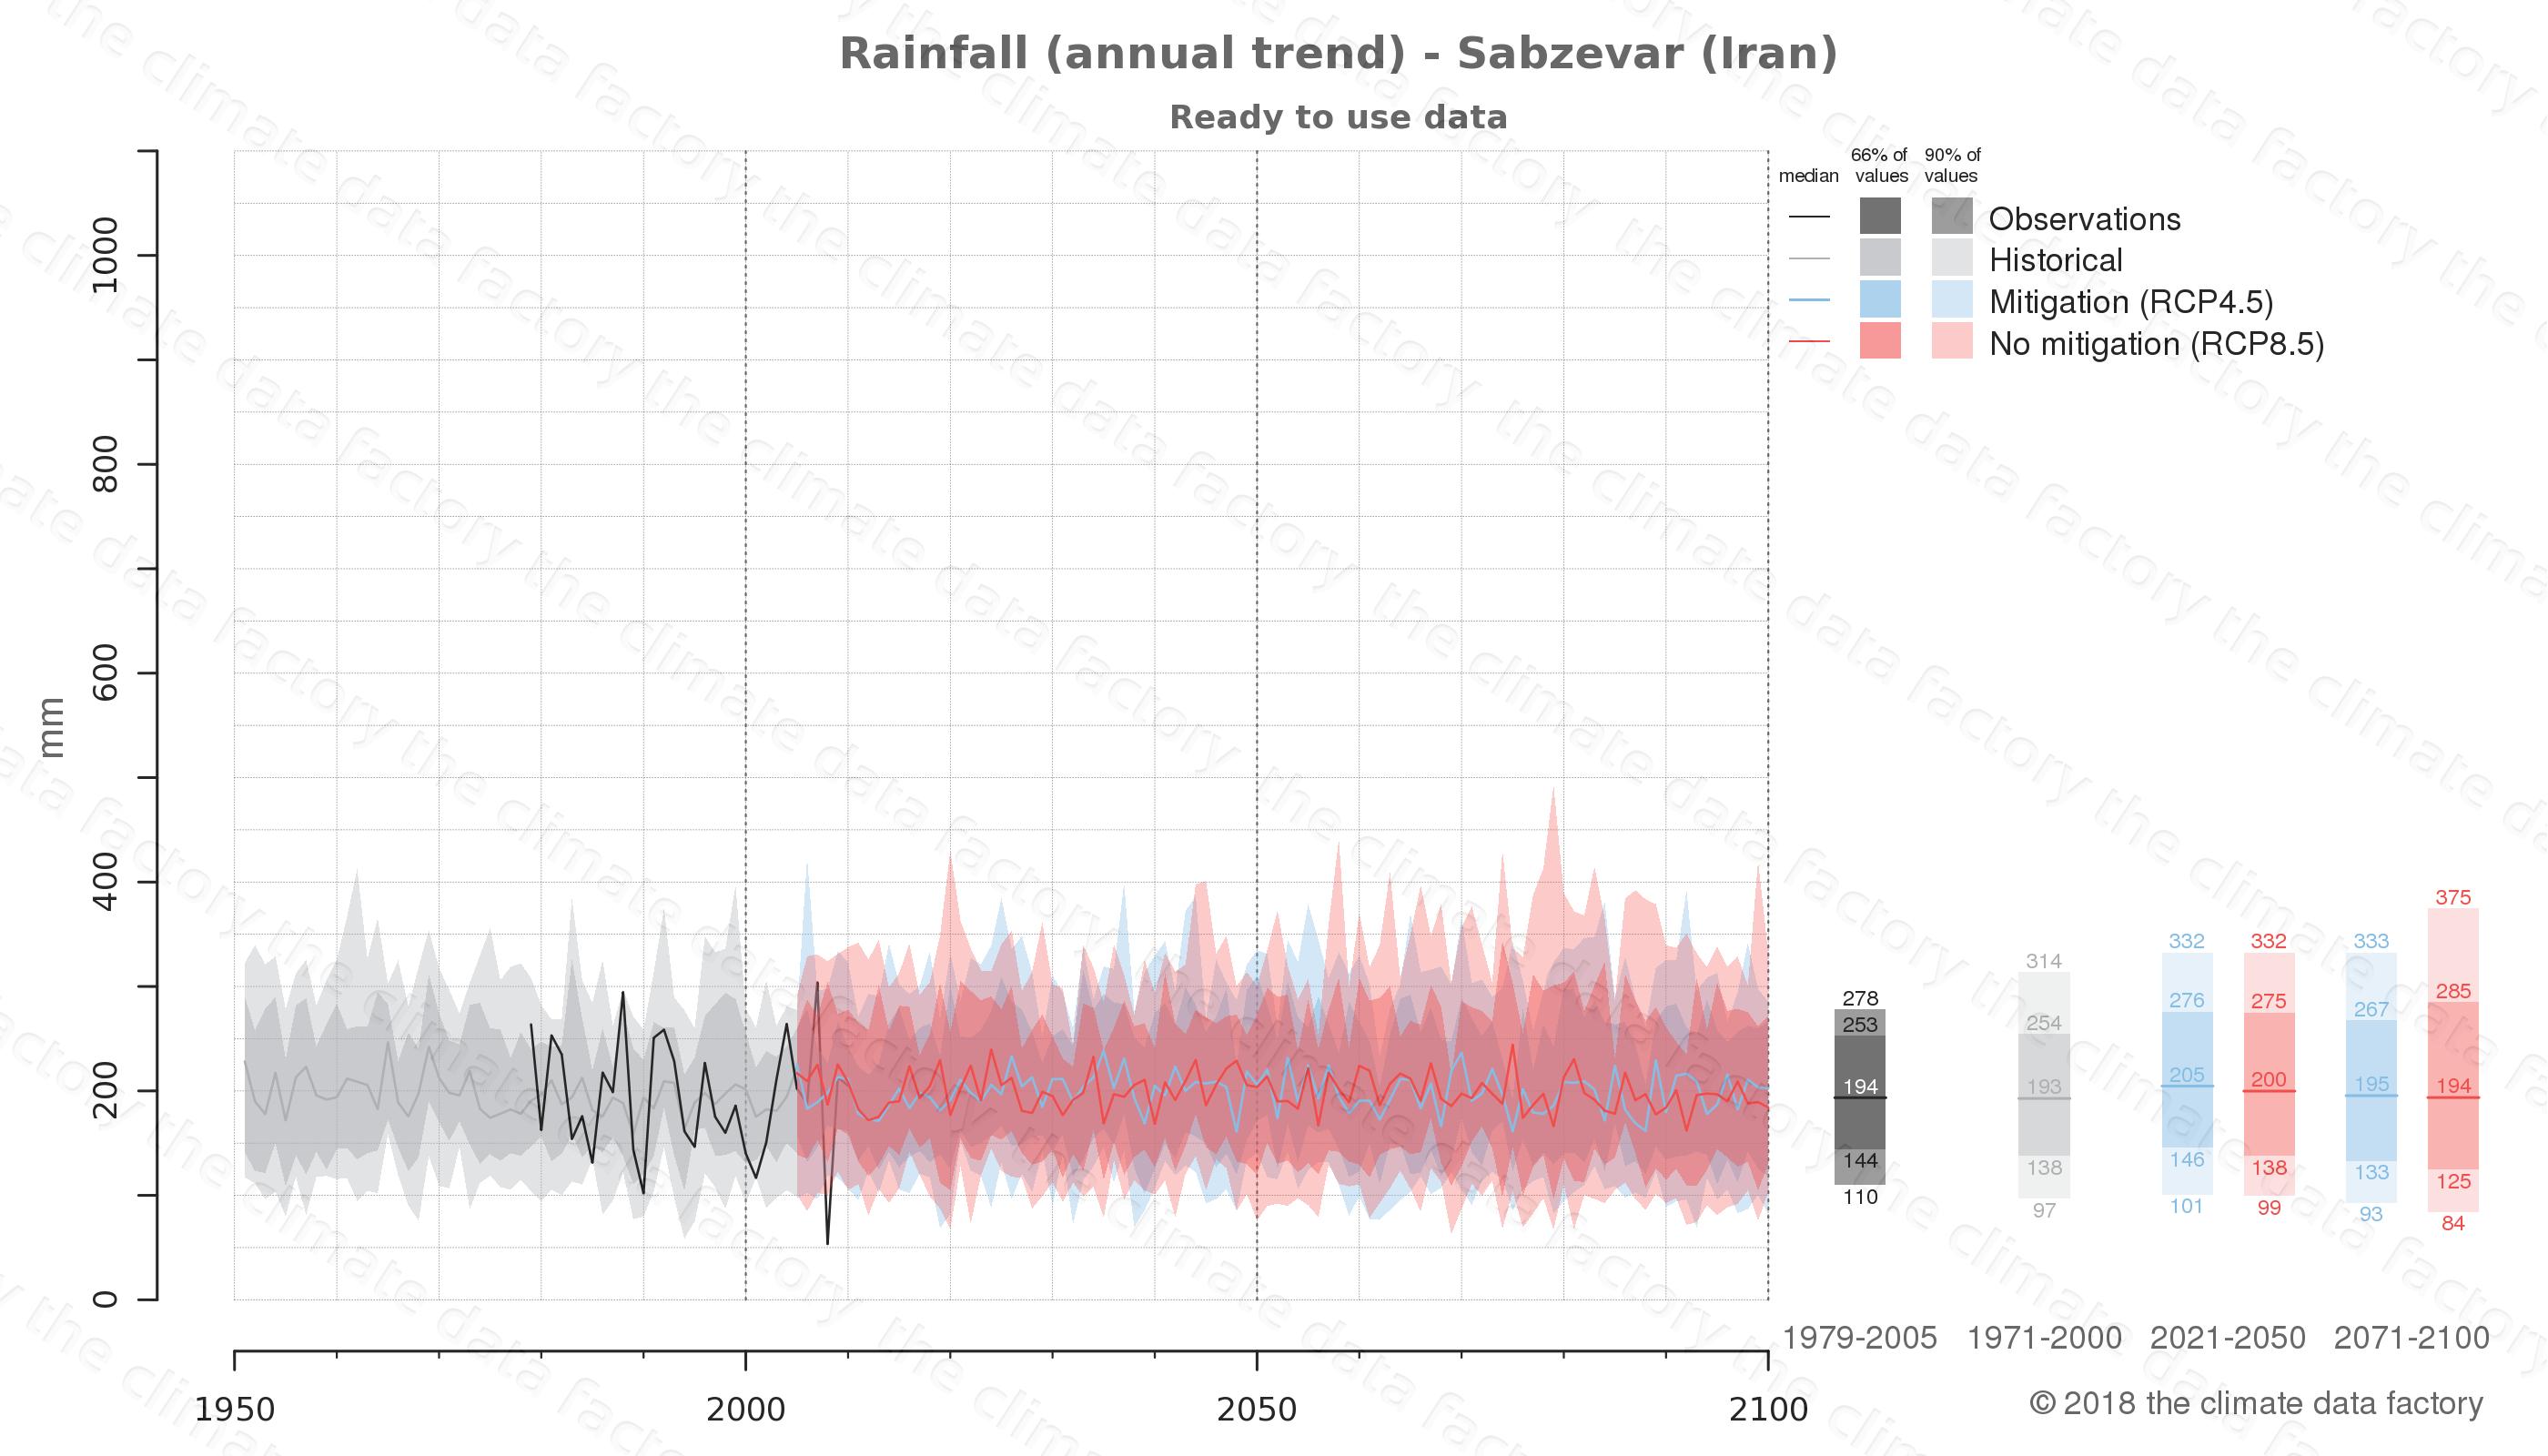 climate change data policy adaptation climate graph city data rainfall sabzevar iran